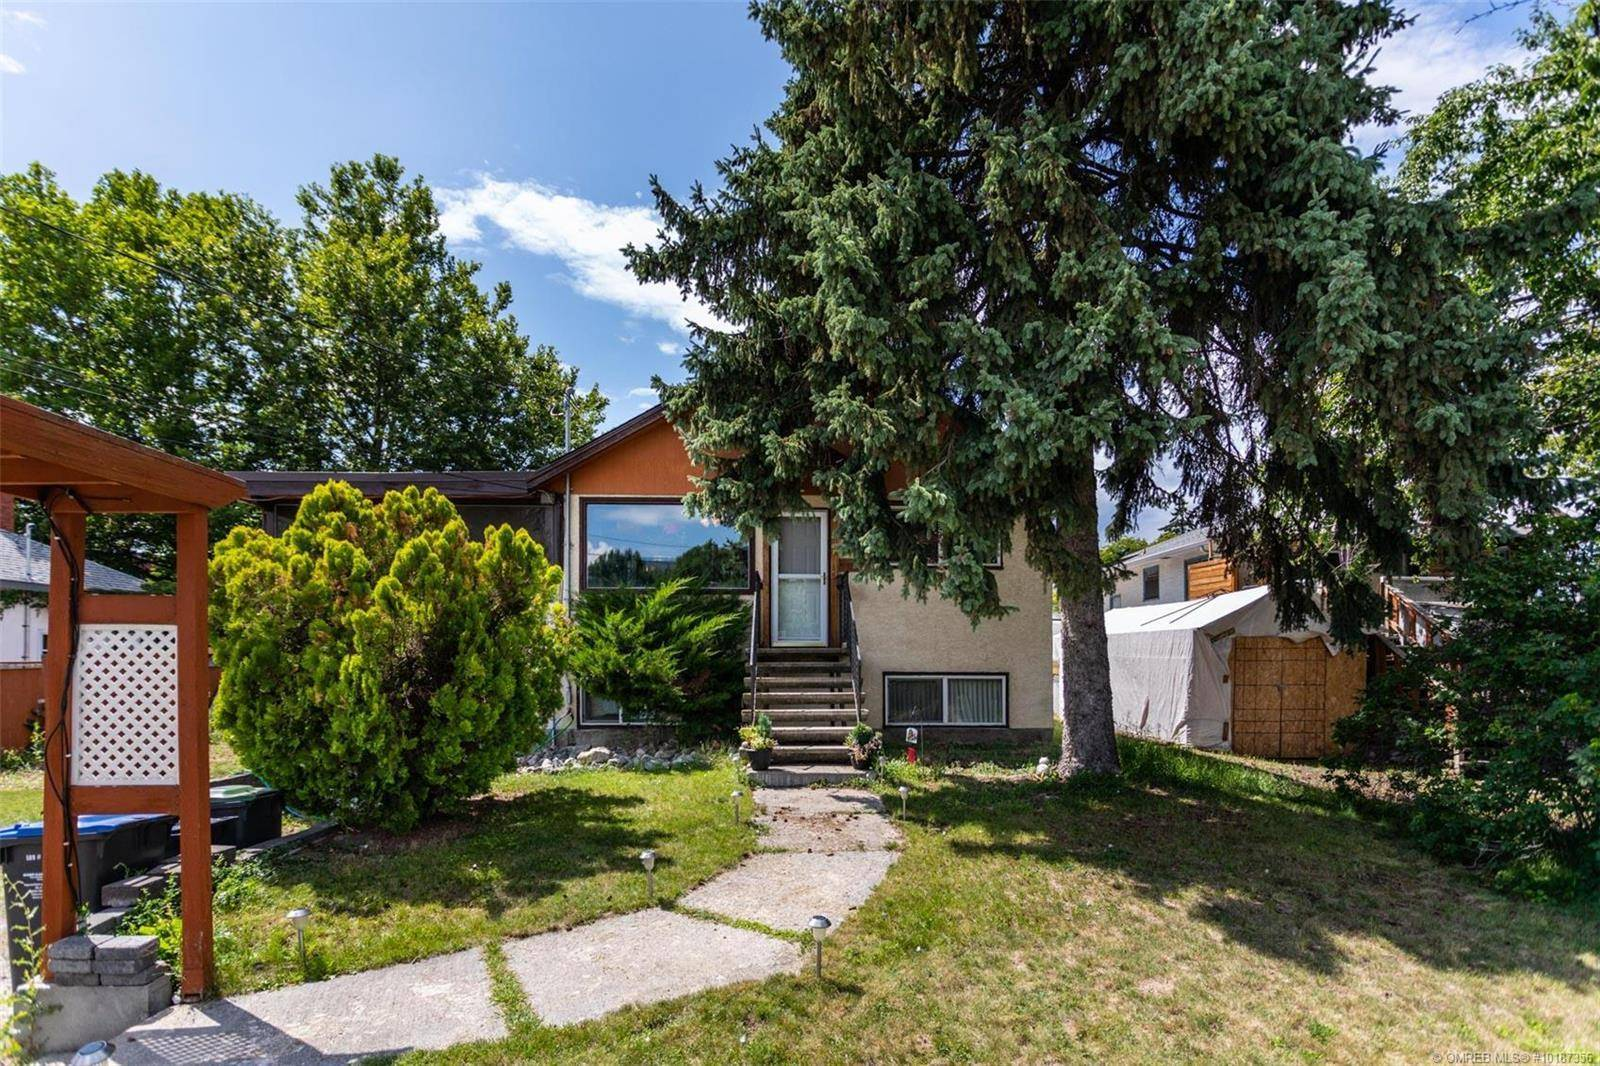 House for sale at 1180 Findlay Rd Kelowna British Columbia - MLS: 10187356